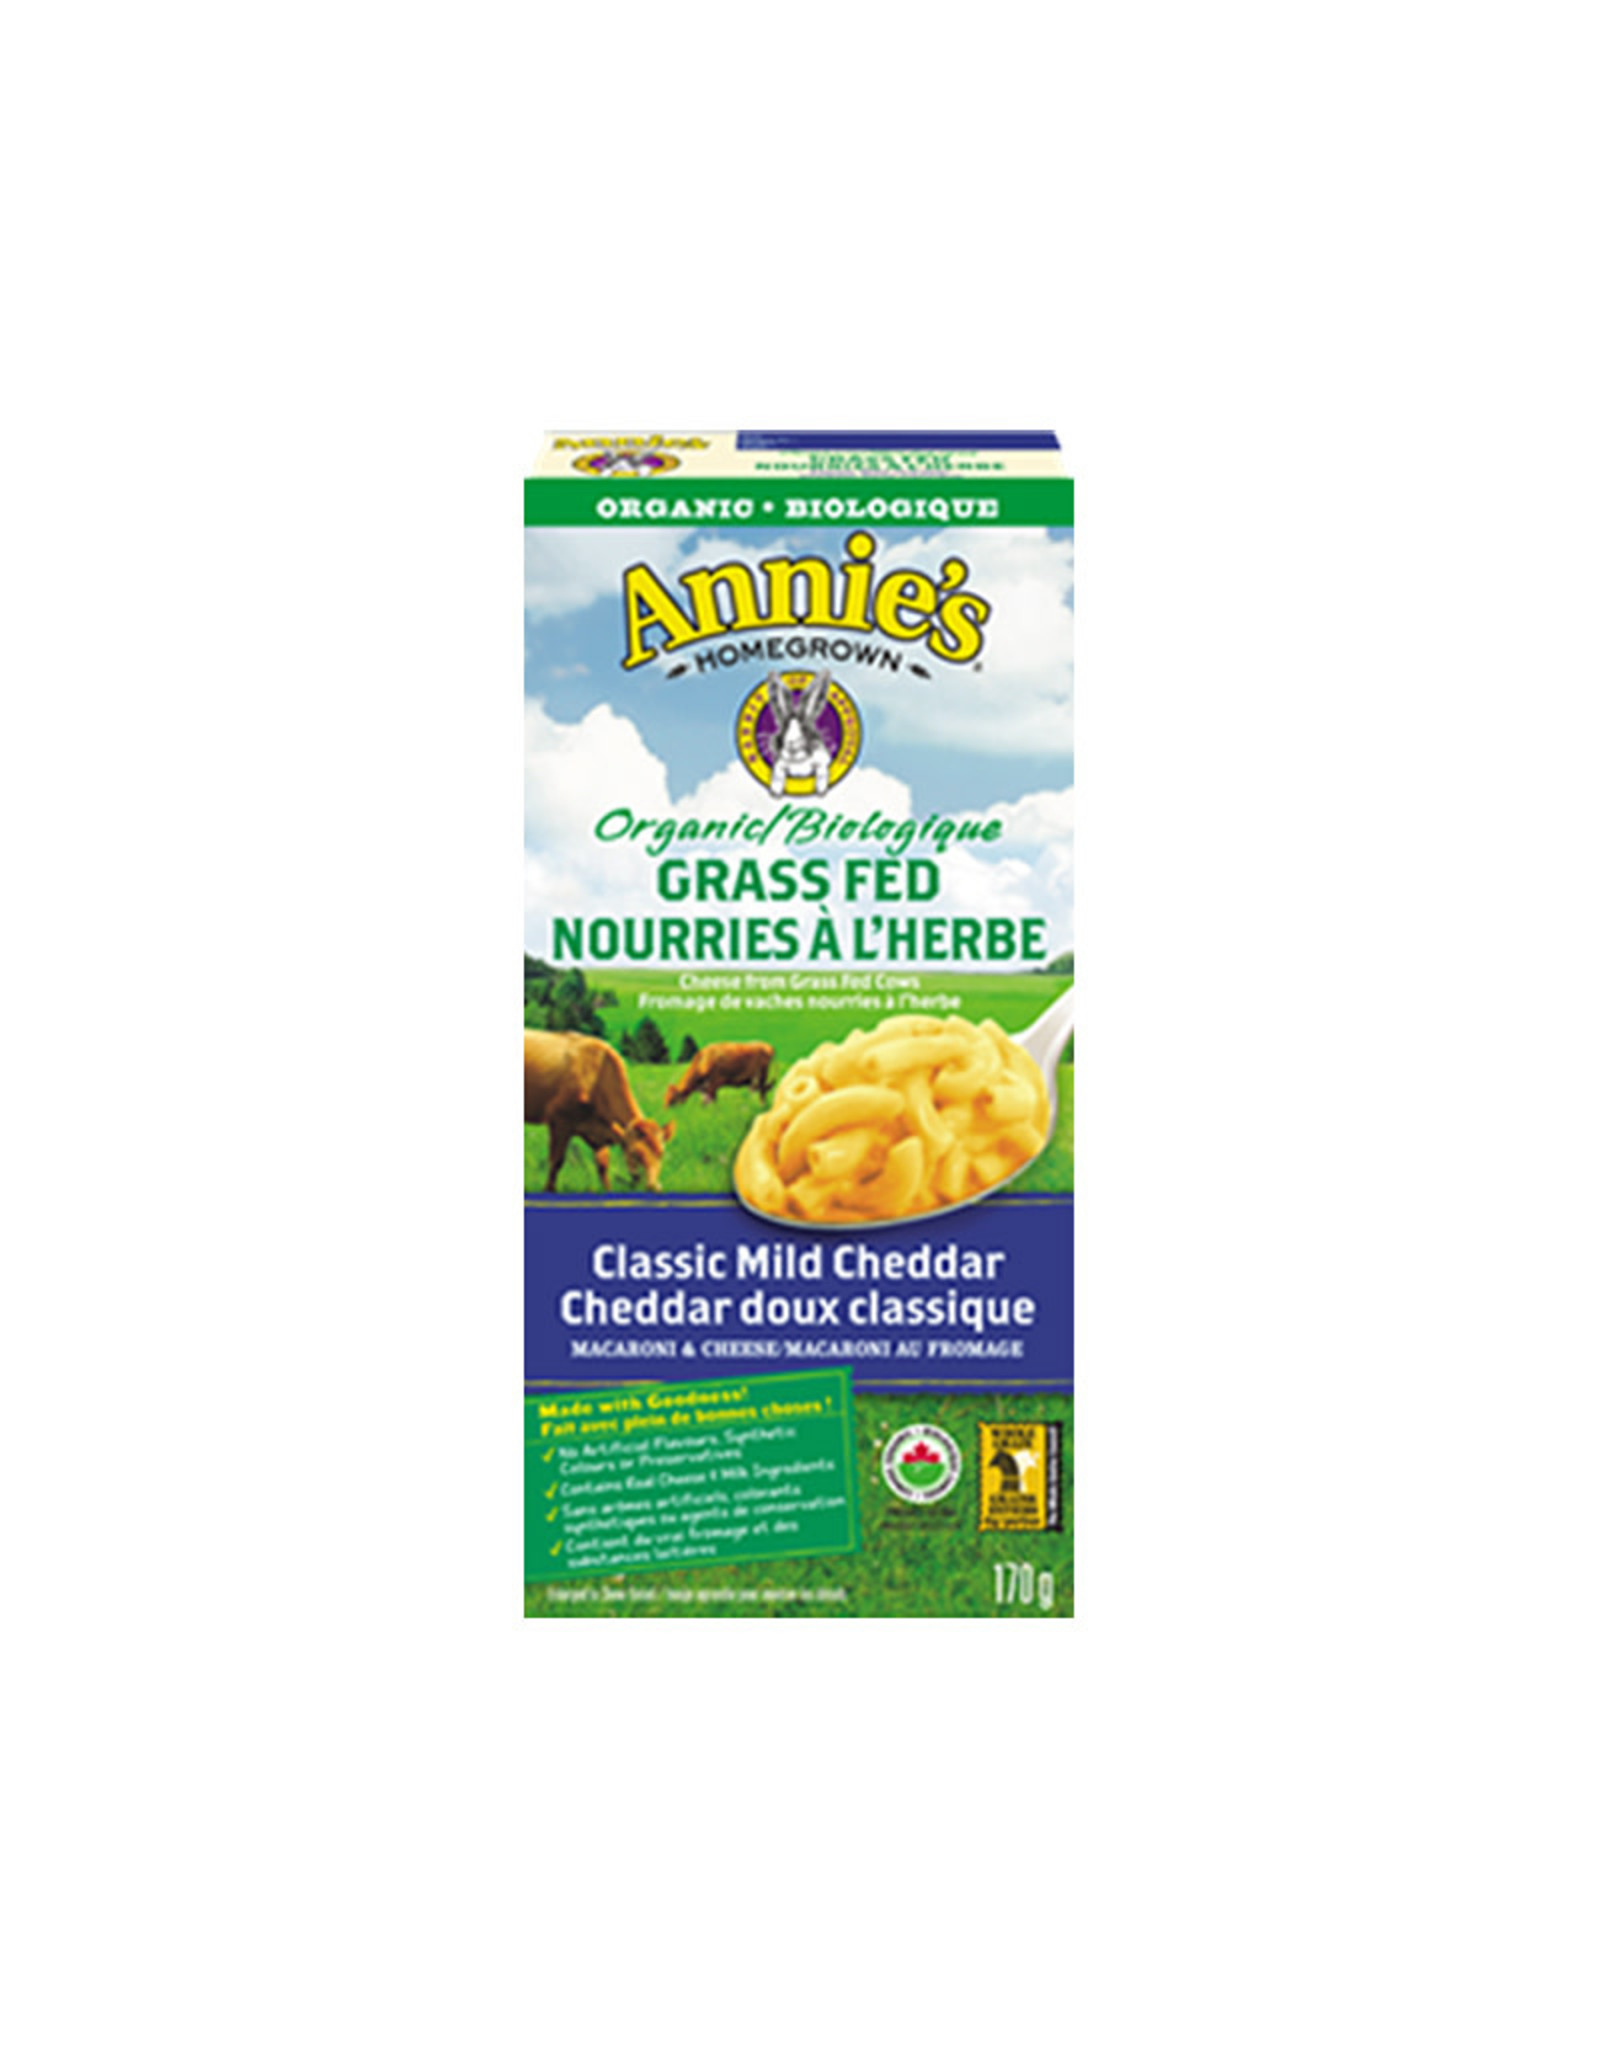 Annies Annies Homegrown - Classic Cheddar Macaroni & Cheese (170g)